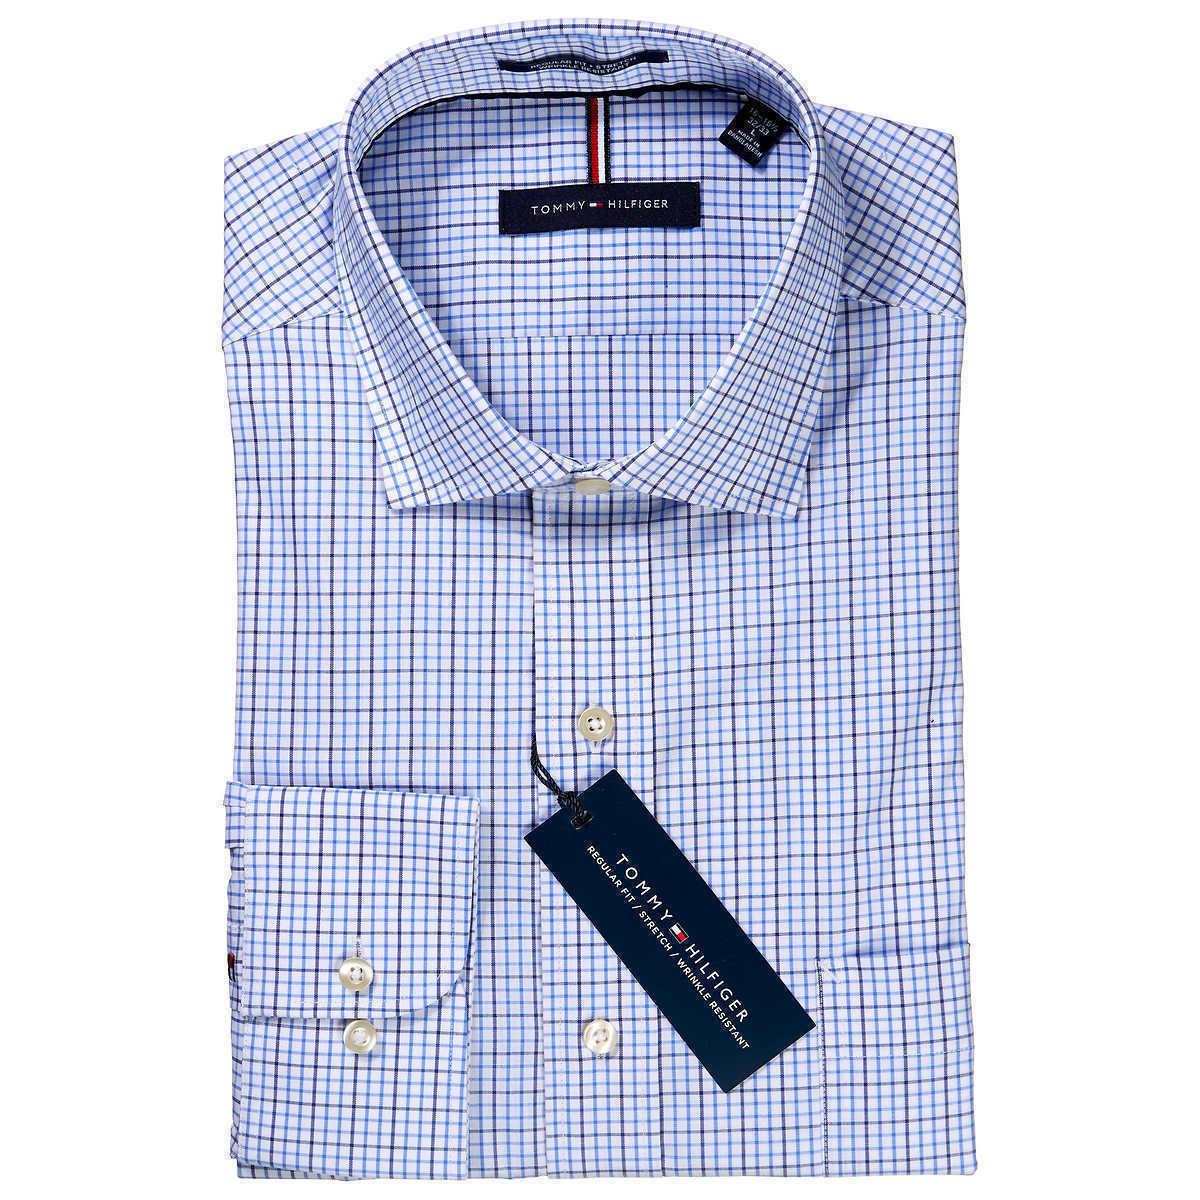 TOMMY HILFIGER THFLEX ANTLANTIC BLUE 19 34 35 BIG DRESS BUTTON FRONT SHIRT NWT